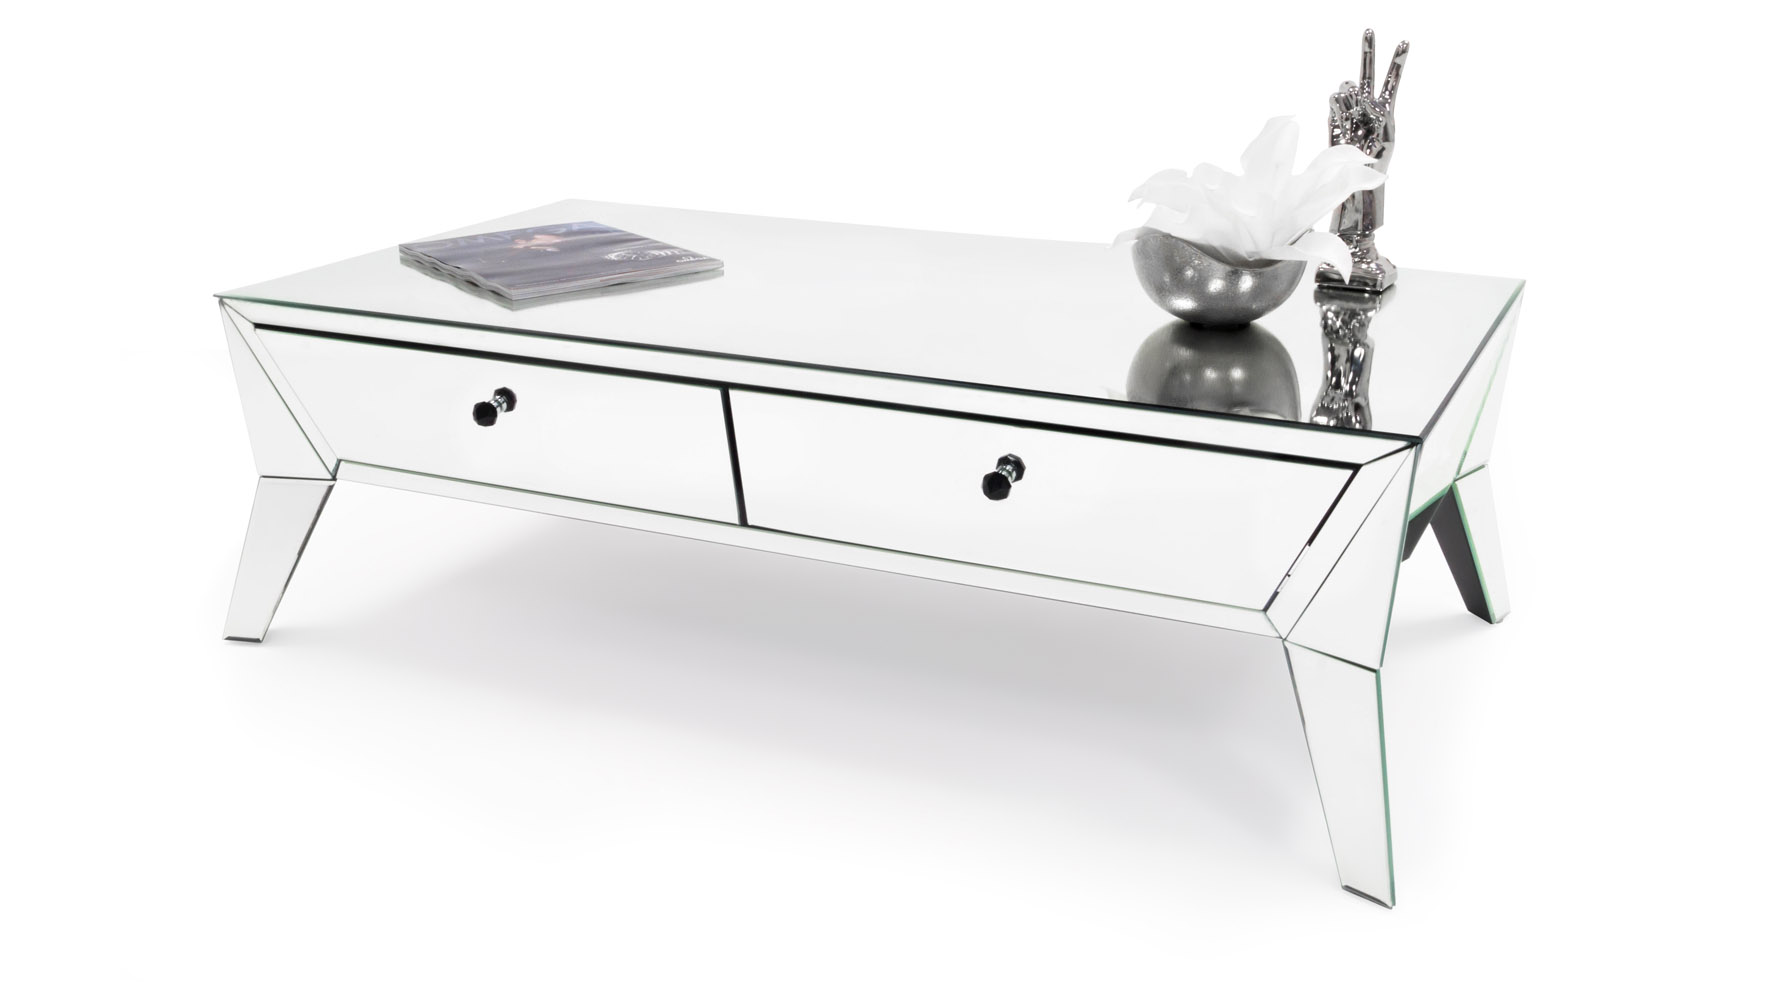 lave mirrored glass coffee table | zuri furniture